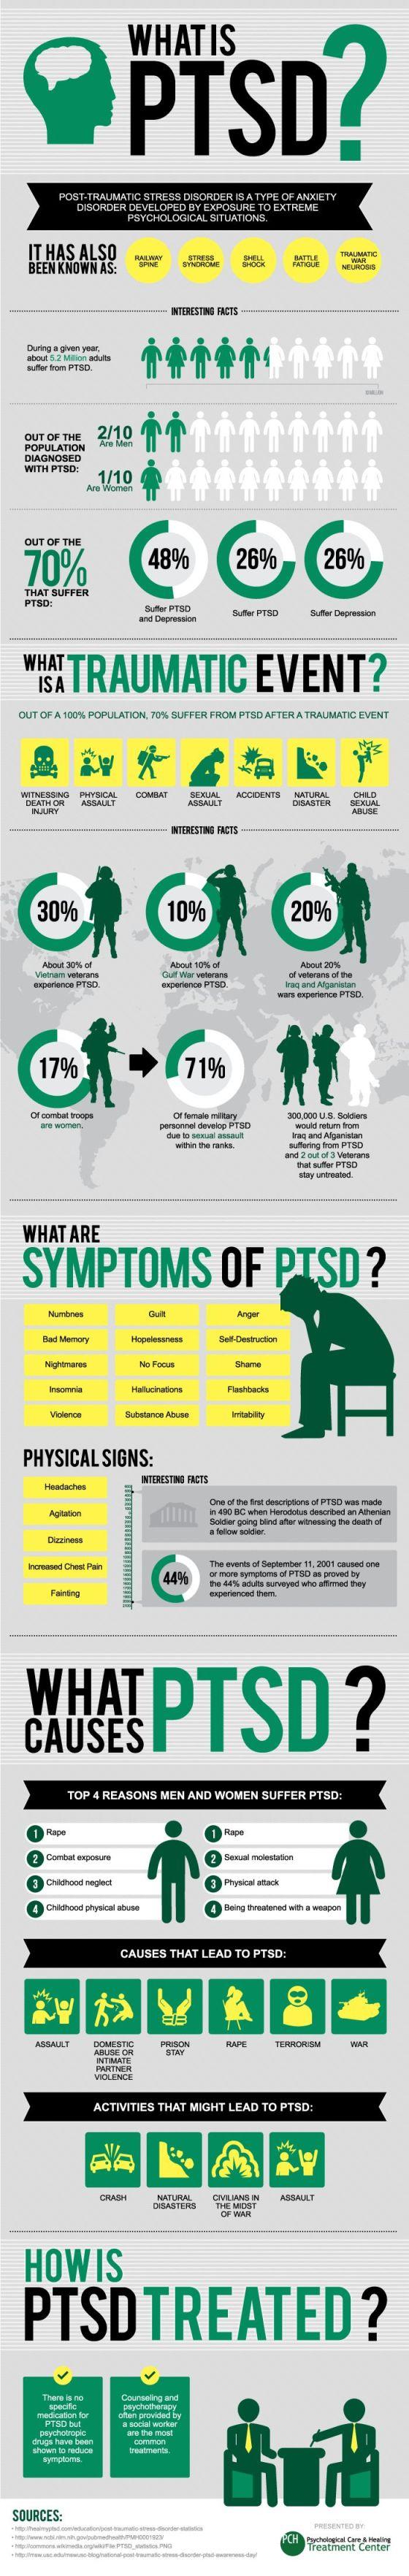 PTSD3